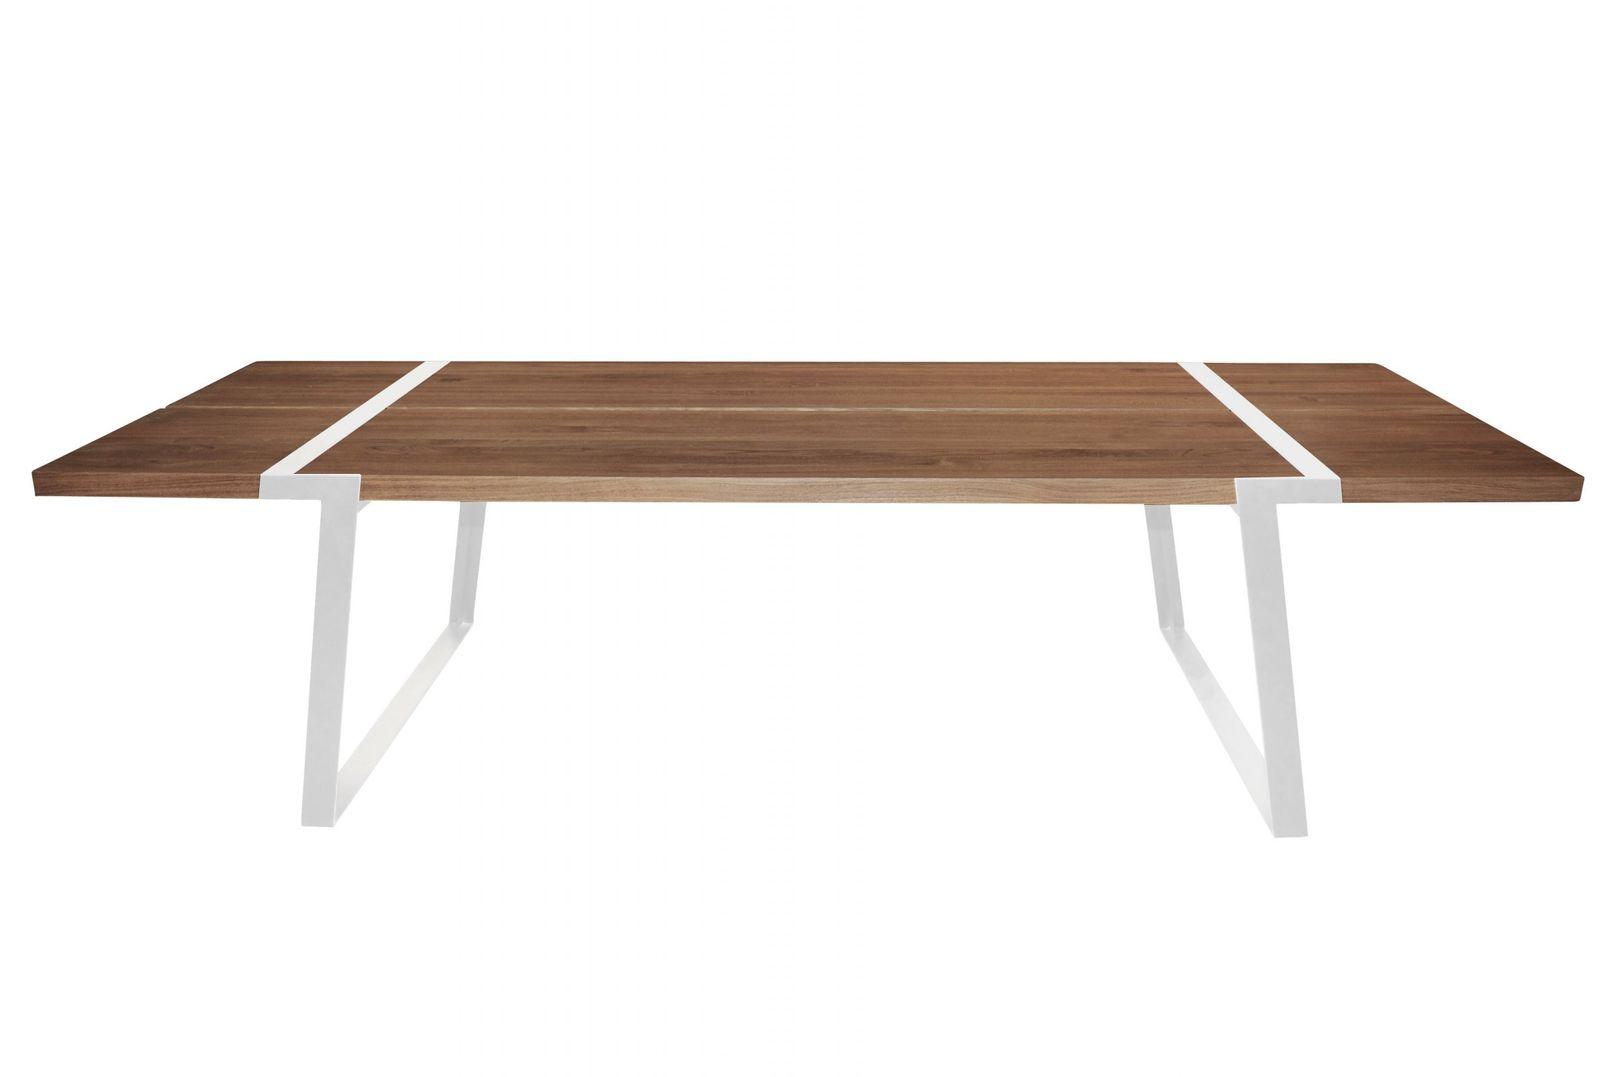 esstisch gigant 290 neutral wei massivholz l290 x b100 x h74 cm. Black Bedroom Furniture Sets. Home Design Ideas